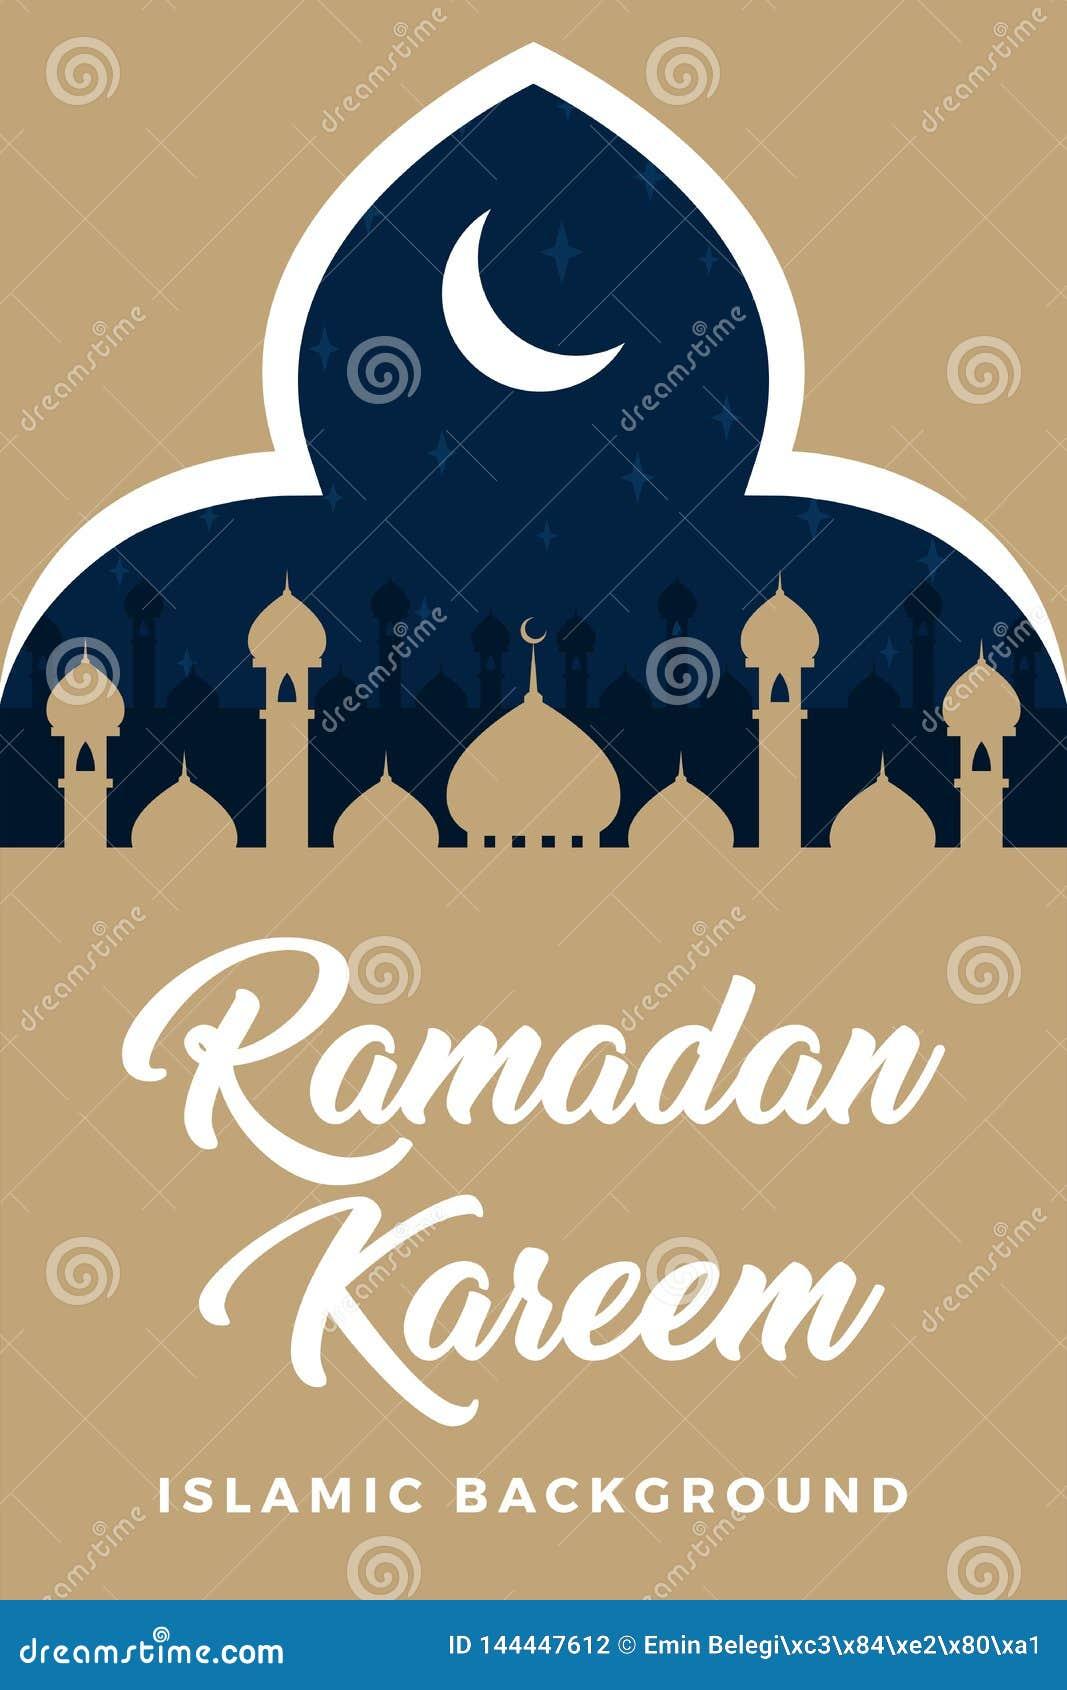 Ramadan Kareem Ramadan Mubarak Greeting Card Vector Illustration Ep Stock Illustration Illustration Of Message Arabian 144447612